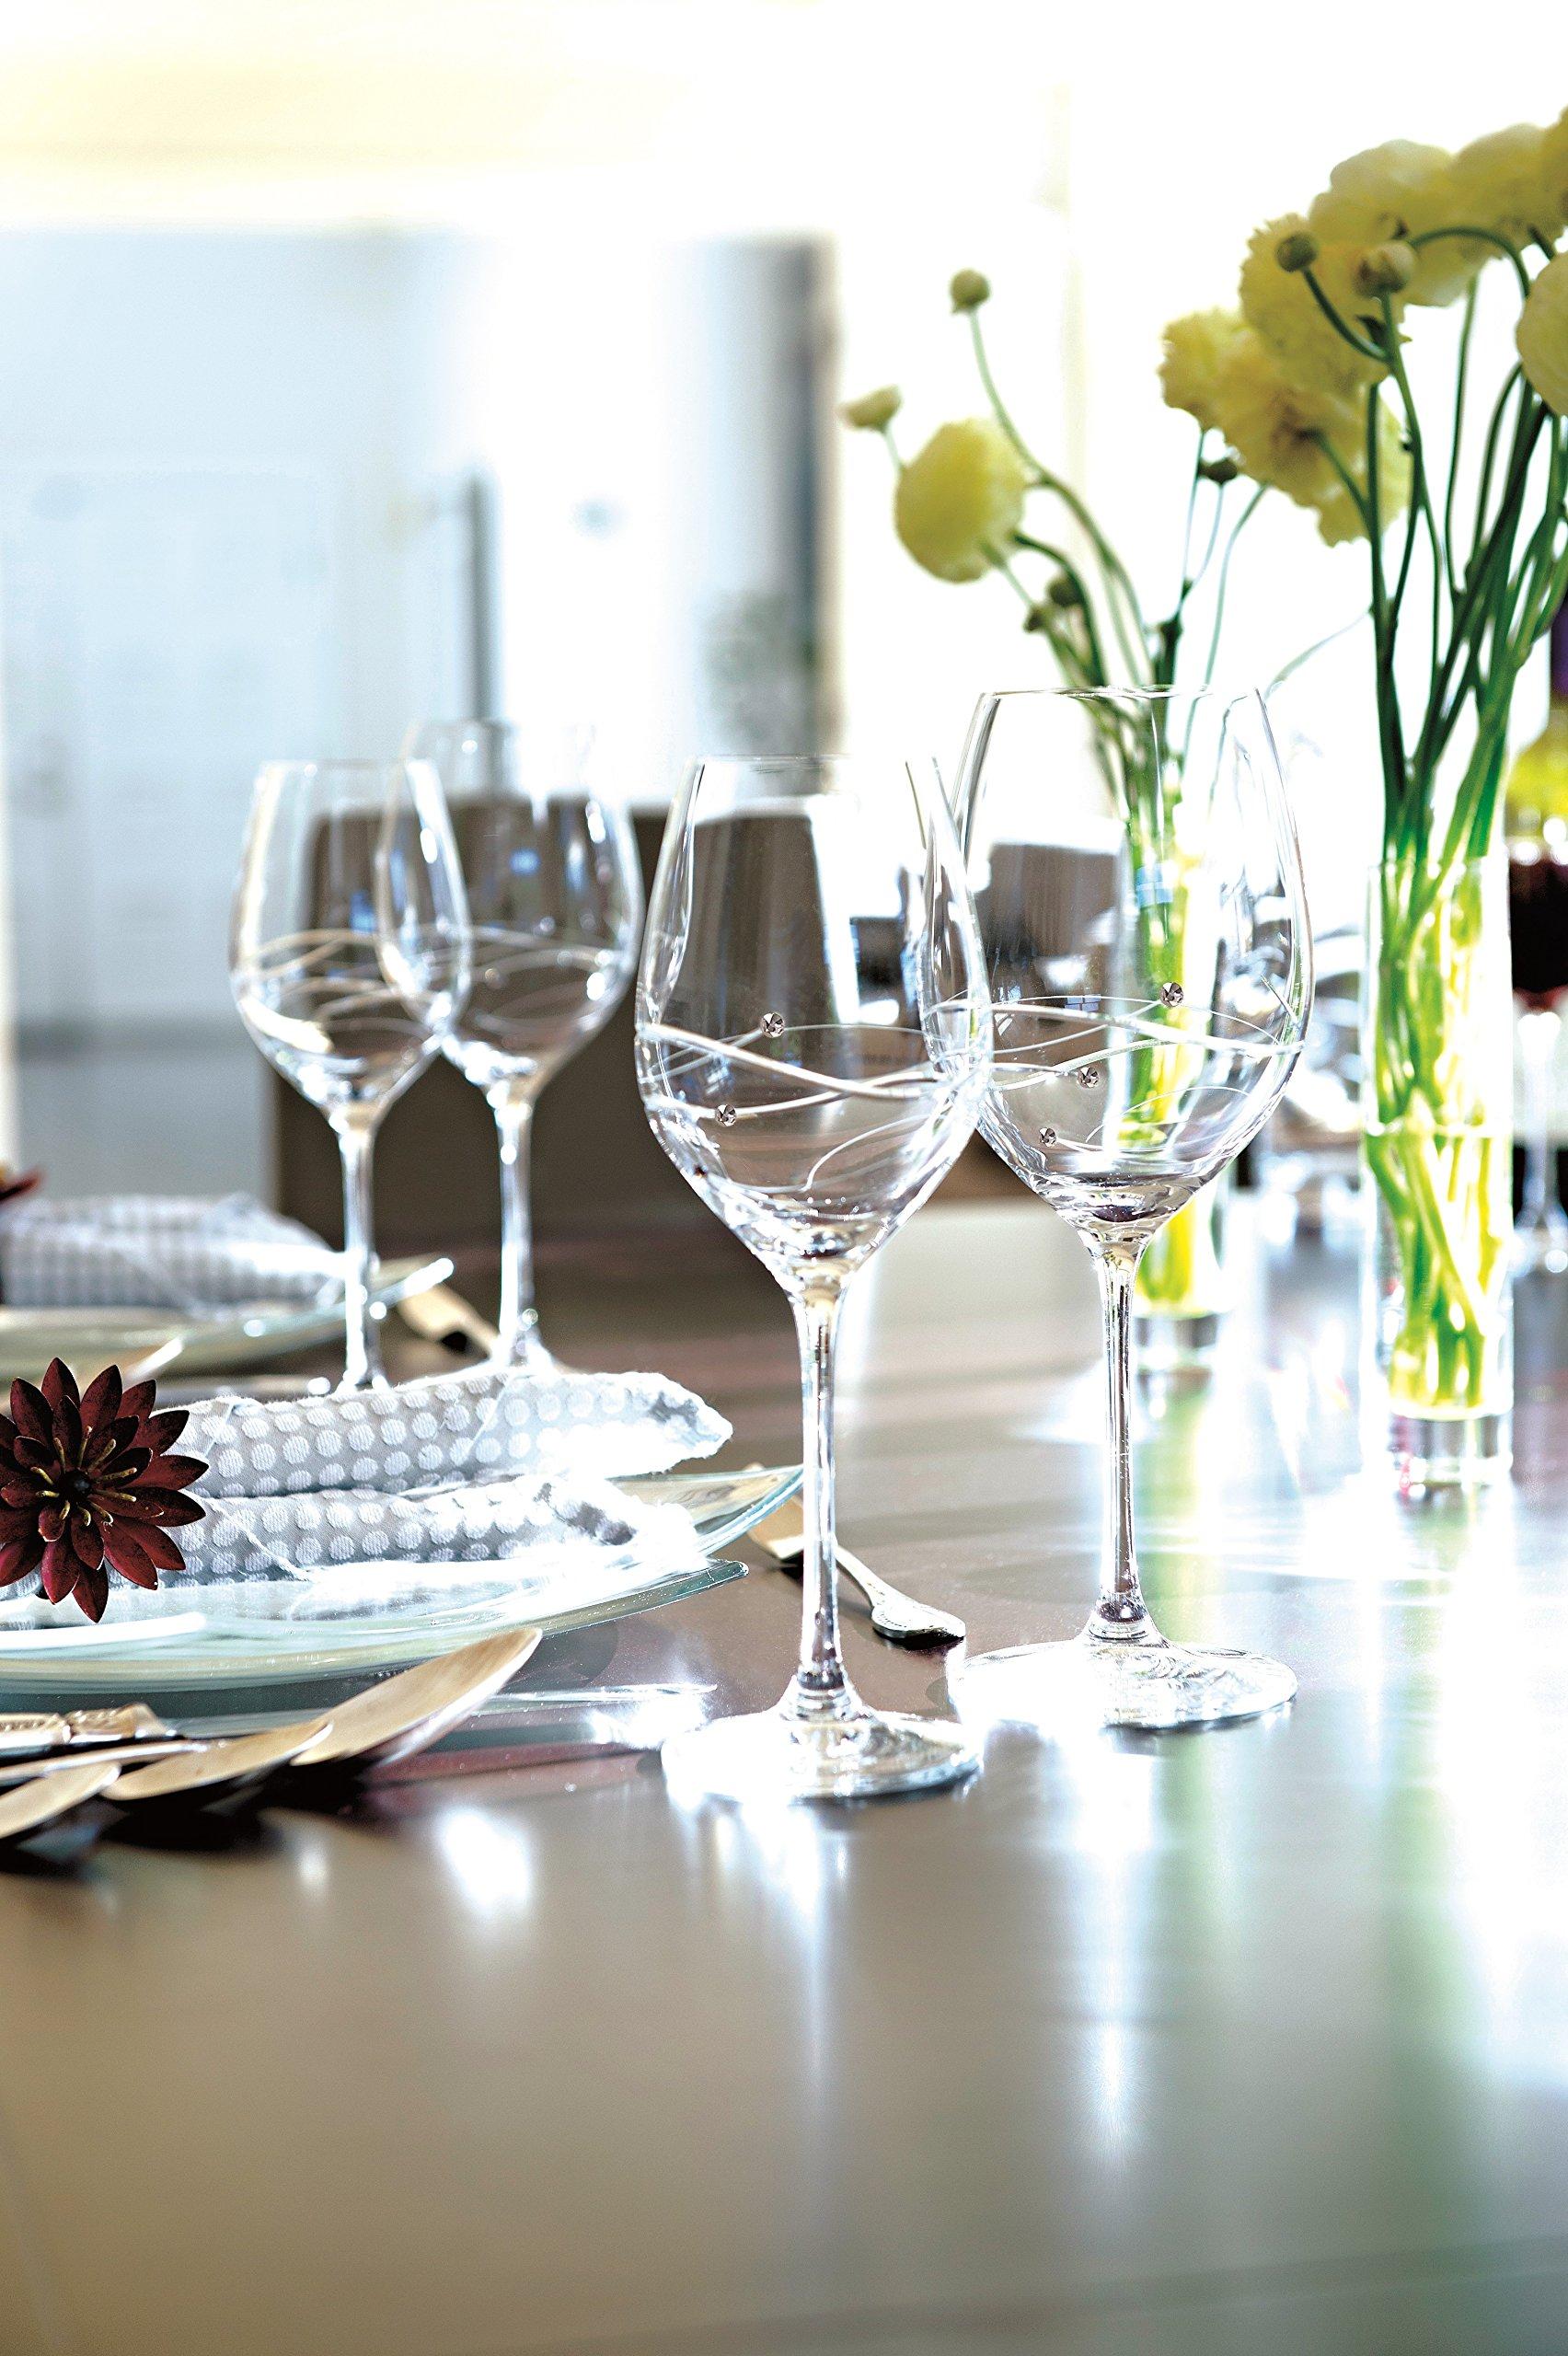 Barski - Handmade Glass - Sparkle - Whiskey Decanter - Decorated with Real Swarovski Diamonds - Gift Boxed - 26 oz .- Made in Europe by BARSKI (Image #5)